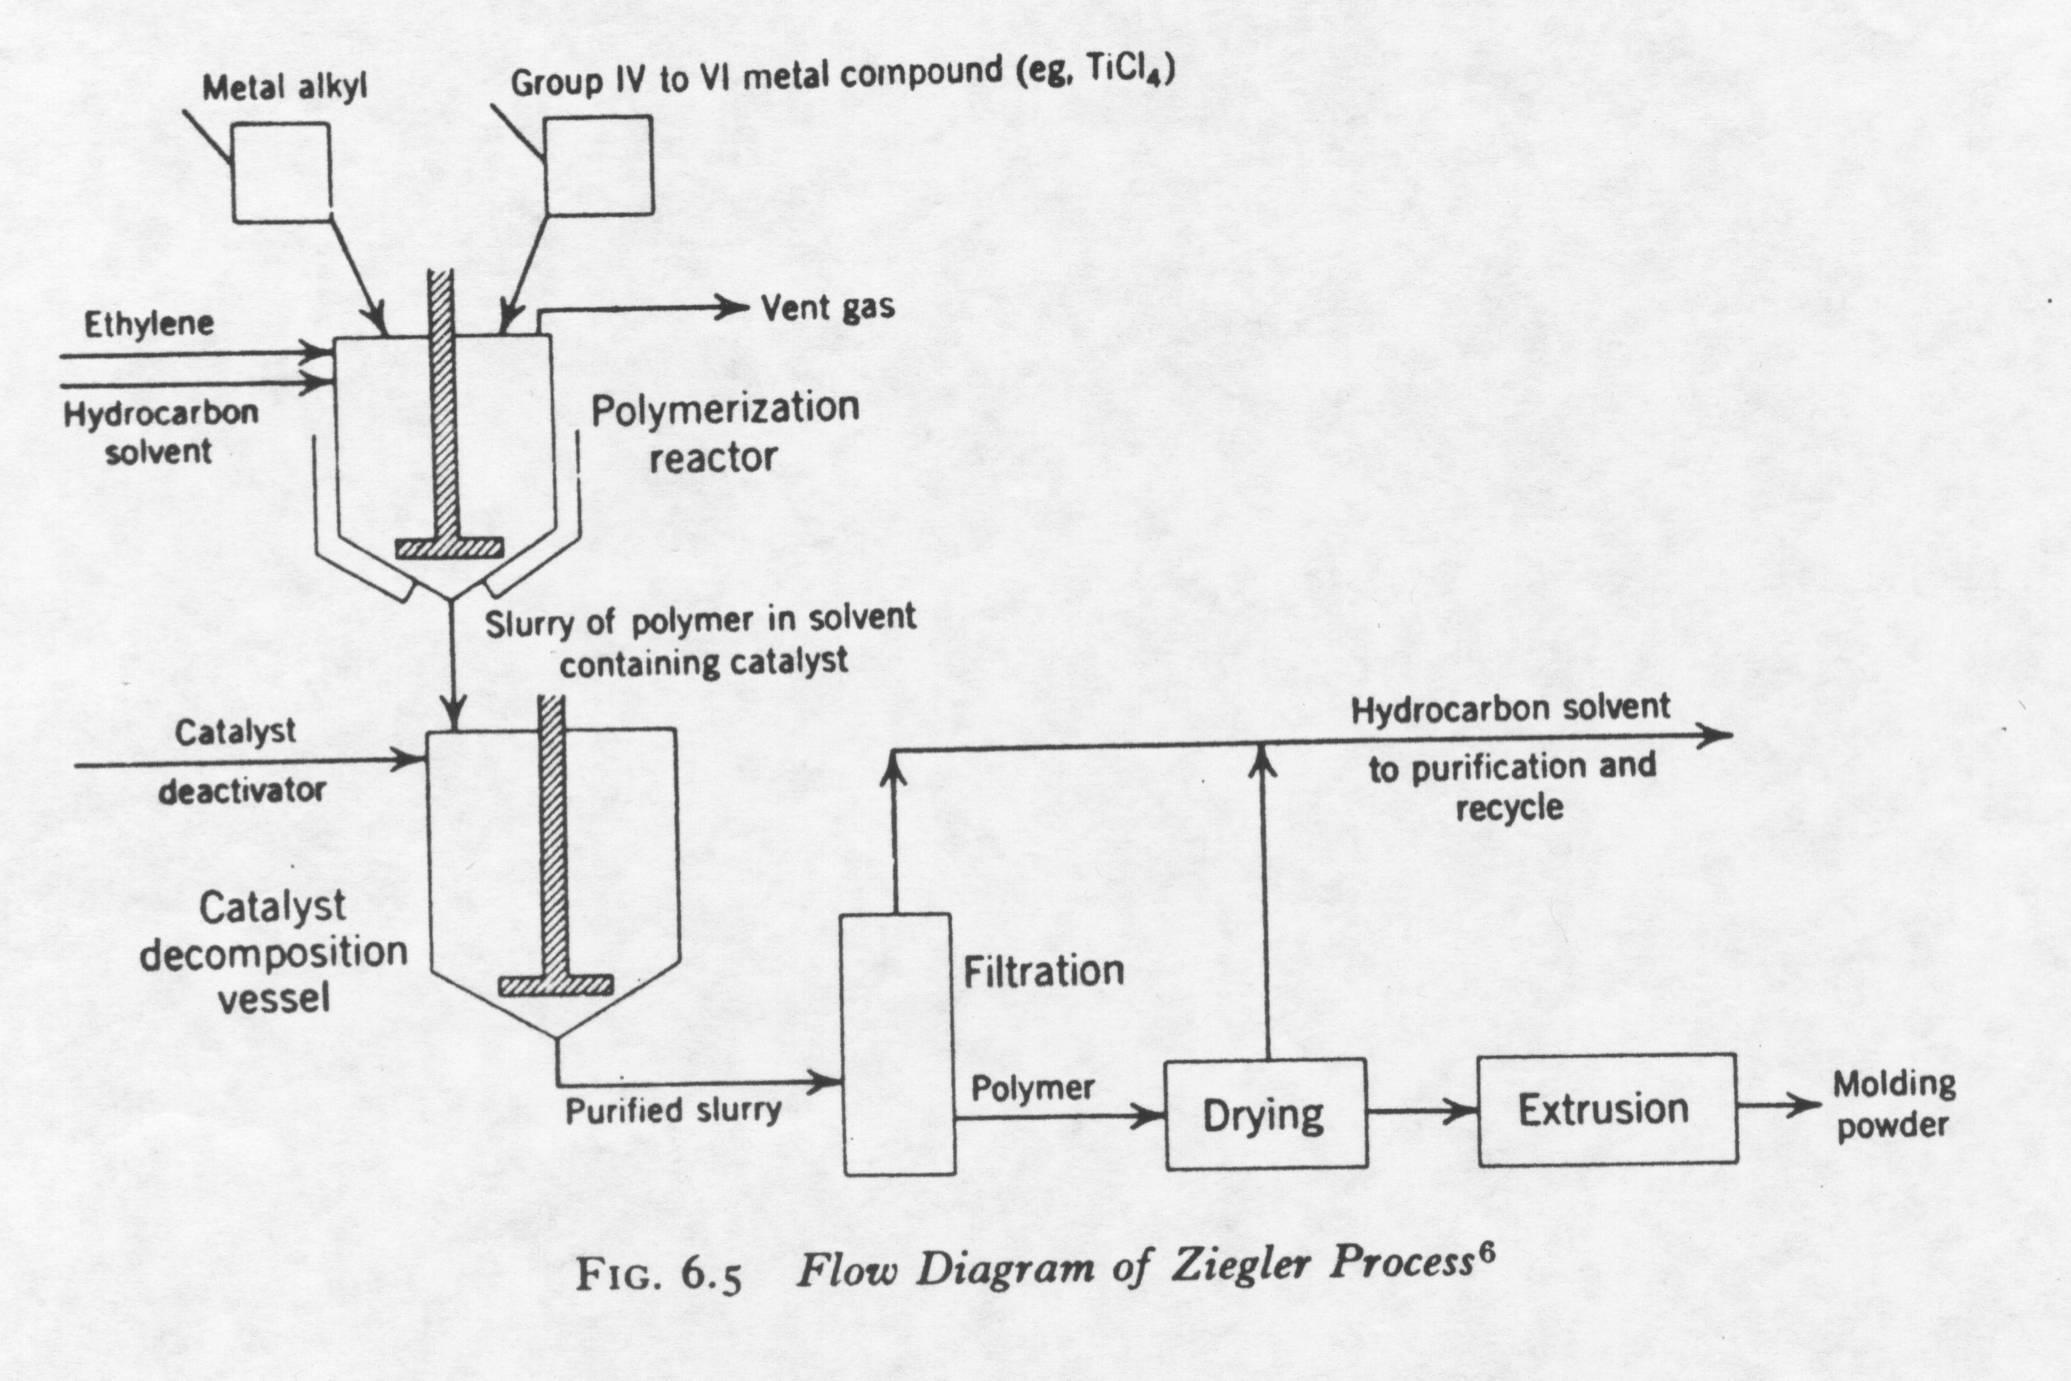 ethylene production process flow diagram glycol ethylene process flow diagram elsavadorla. Black Bedroom Furniture Sets. Home Design Ideas